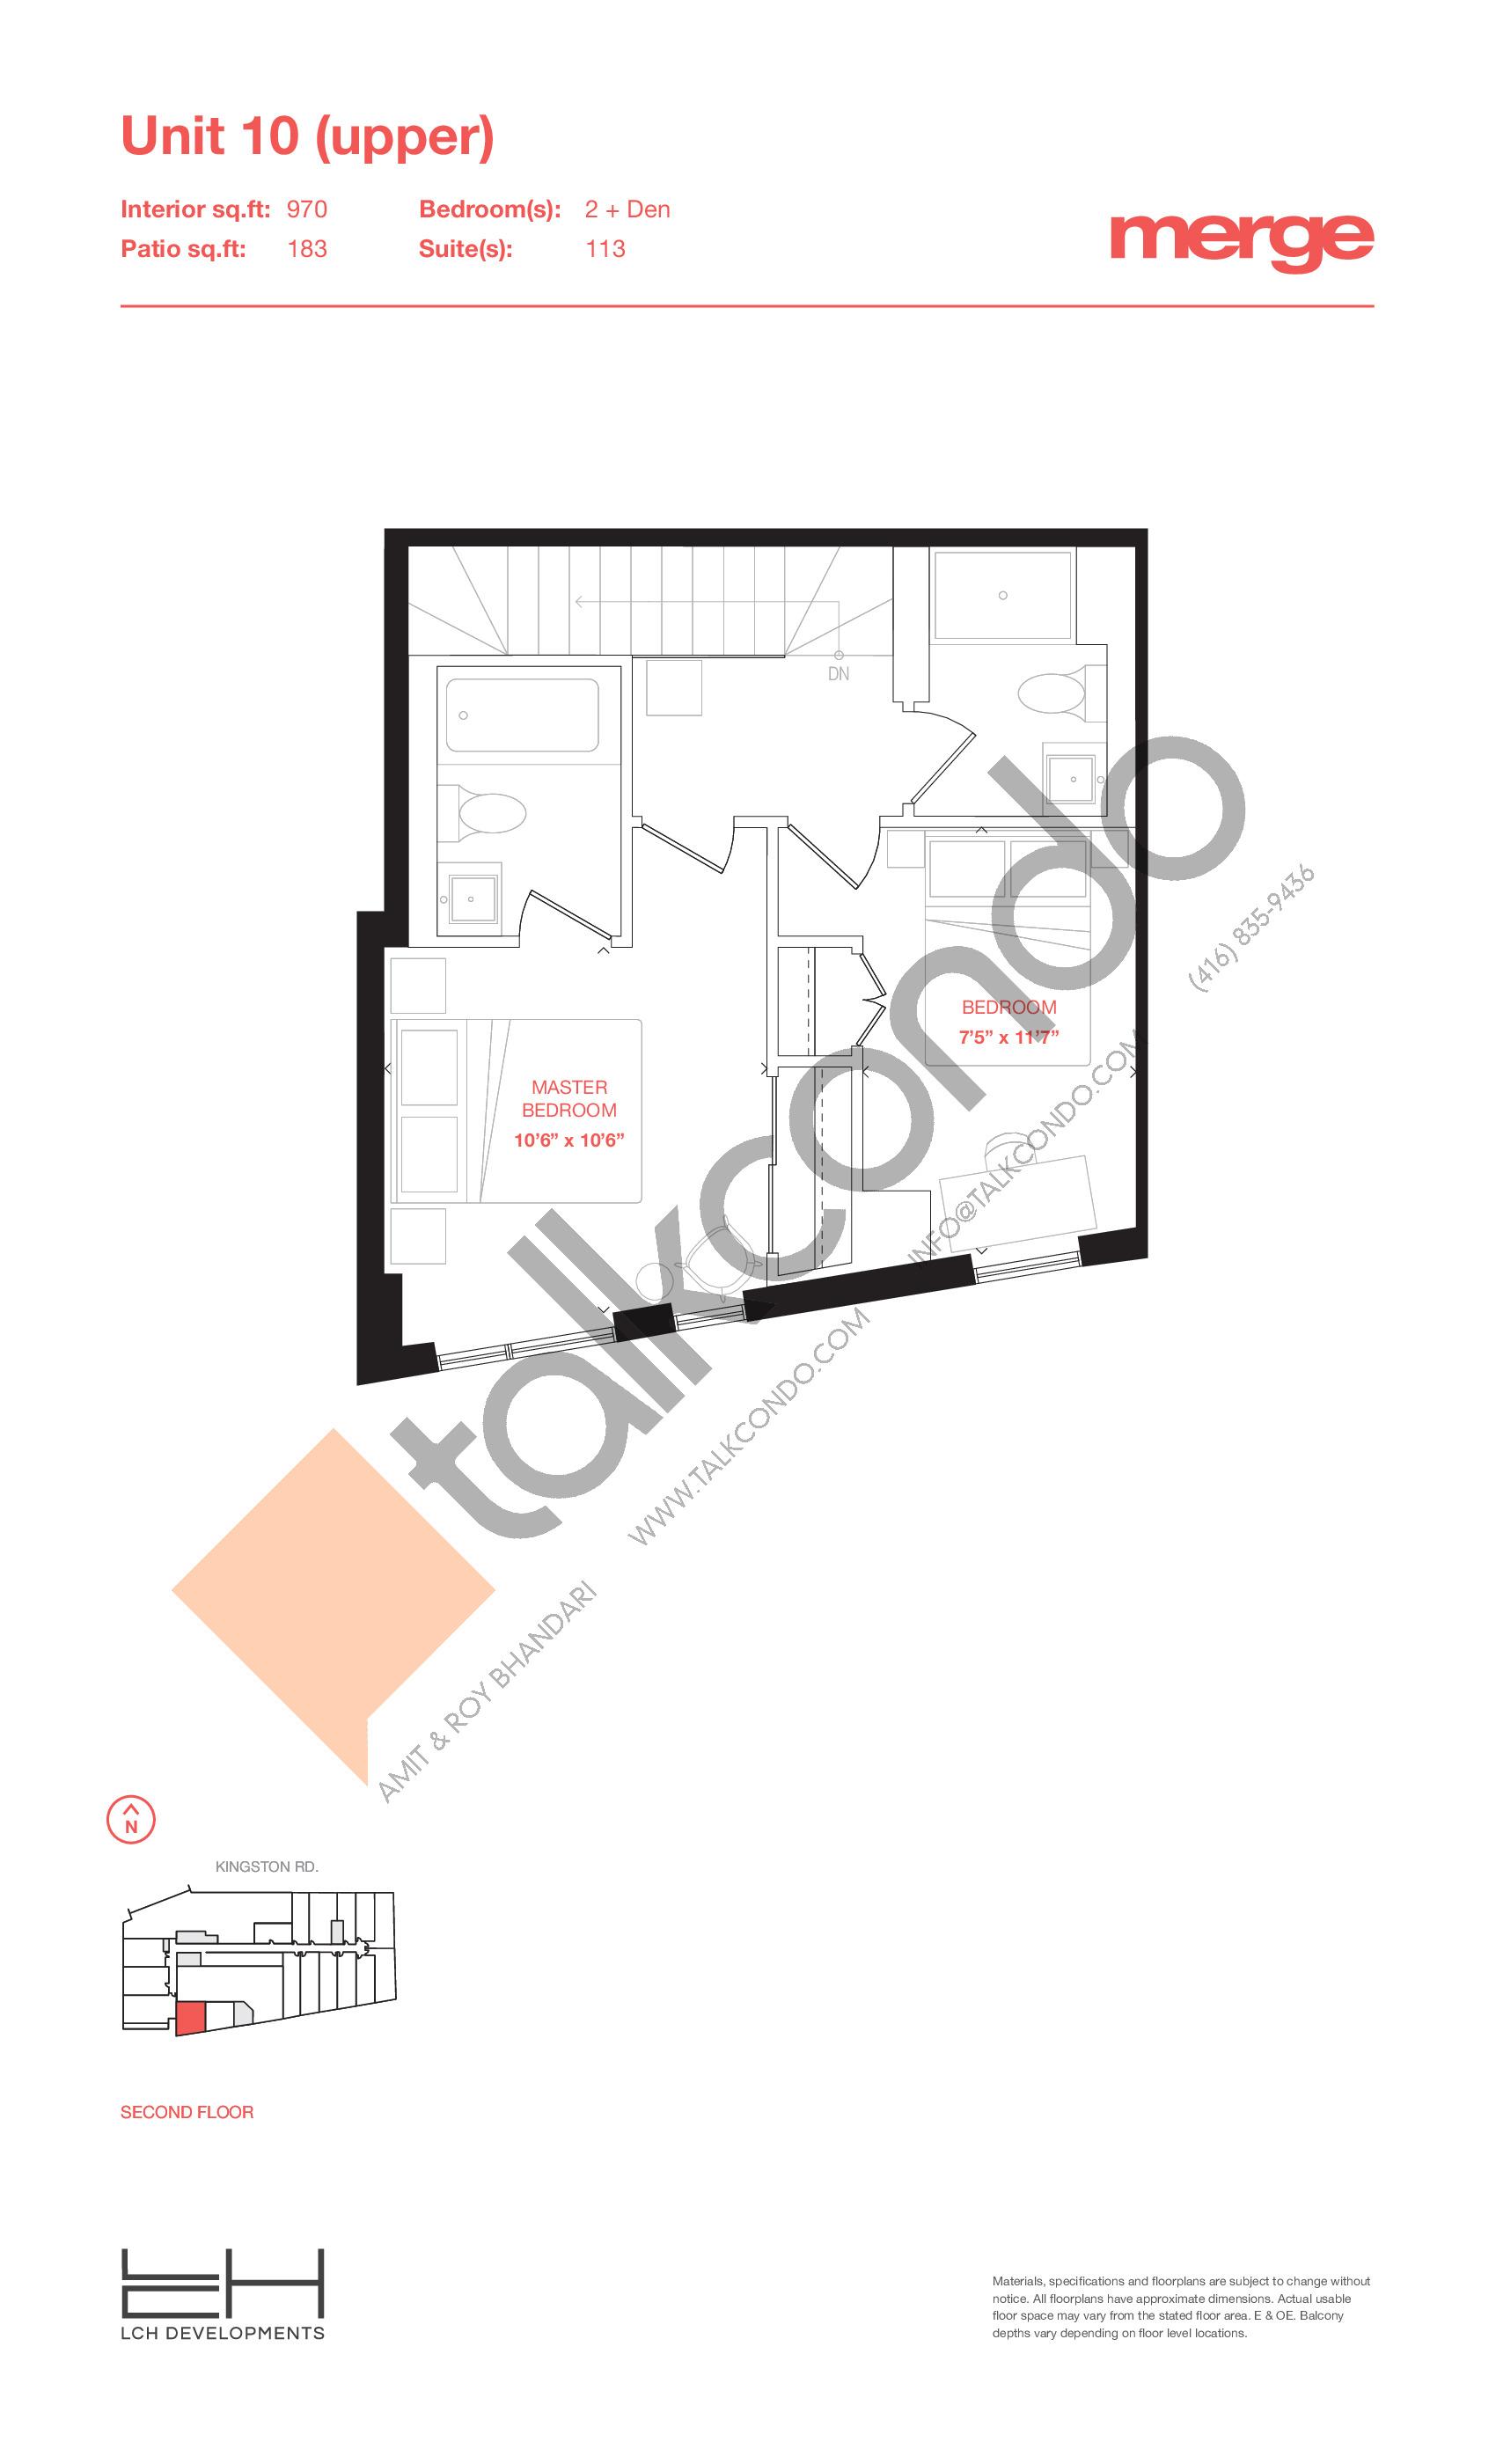 Unit 10 (Upper) - Townhouse Floor Plan at Merge Condos - 970 sq.ft